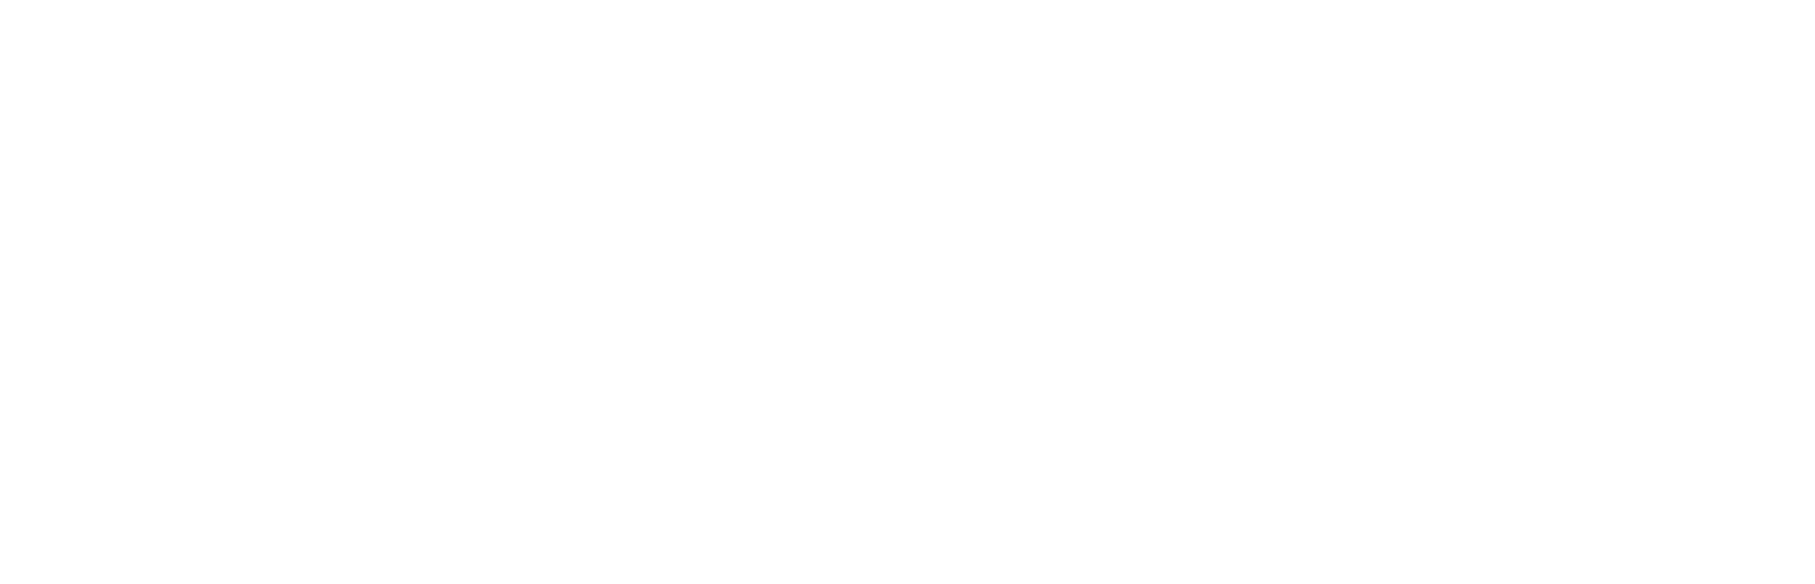 UMassMemorial Medical Group